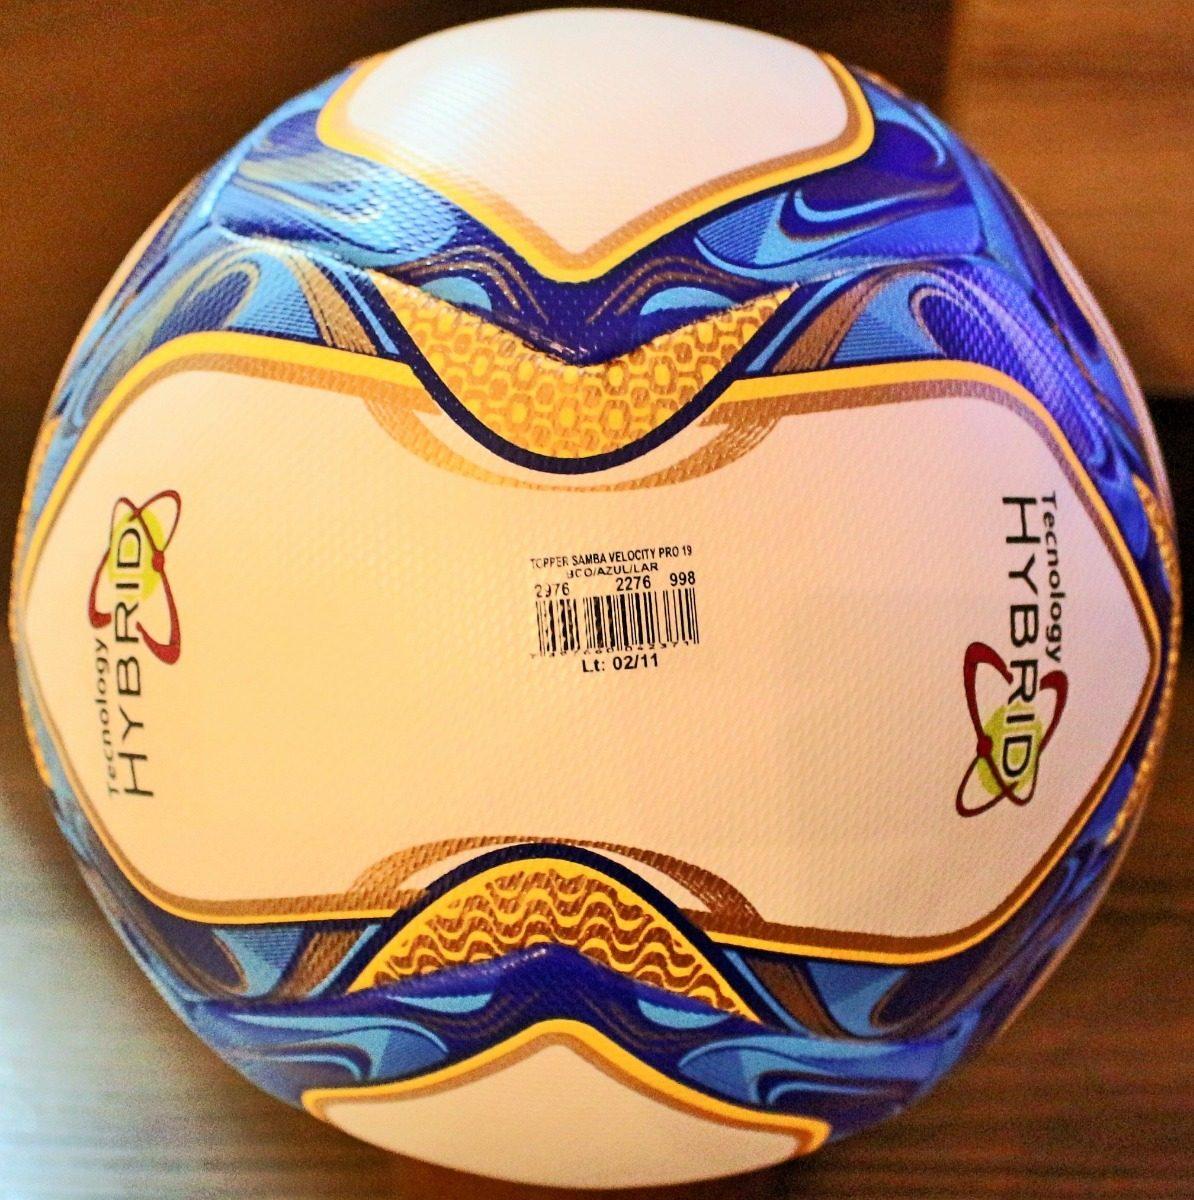 e843300184 nova bola topper samba velocity pro carioca 2019. Carregando zoom.